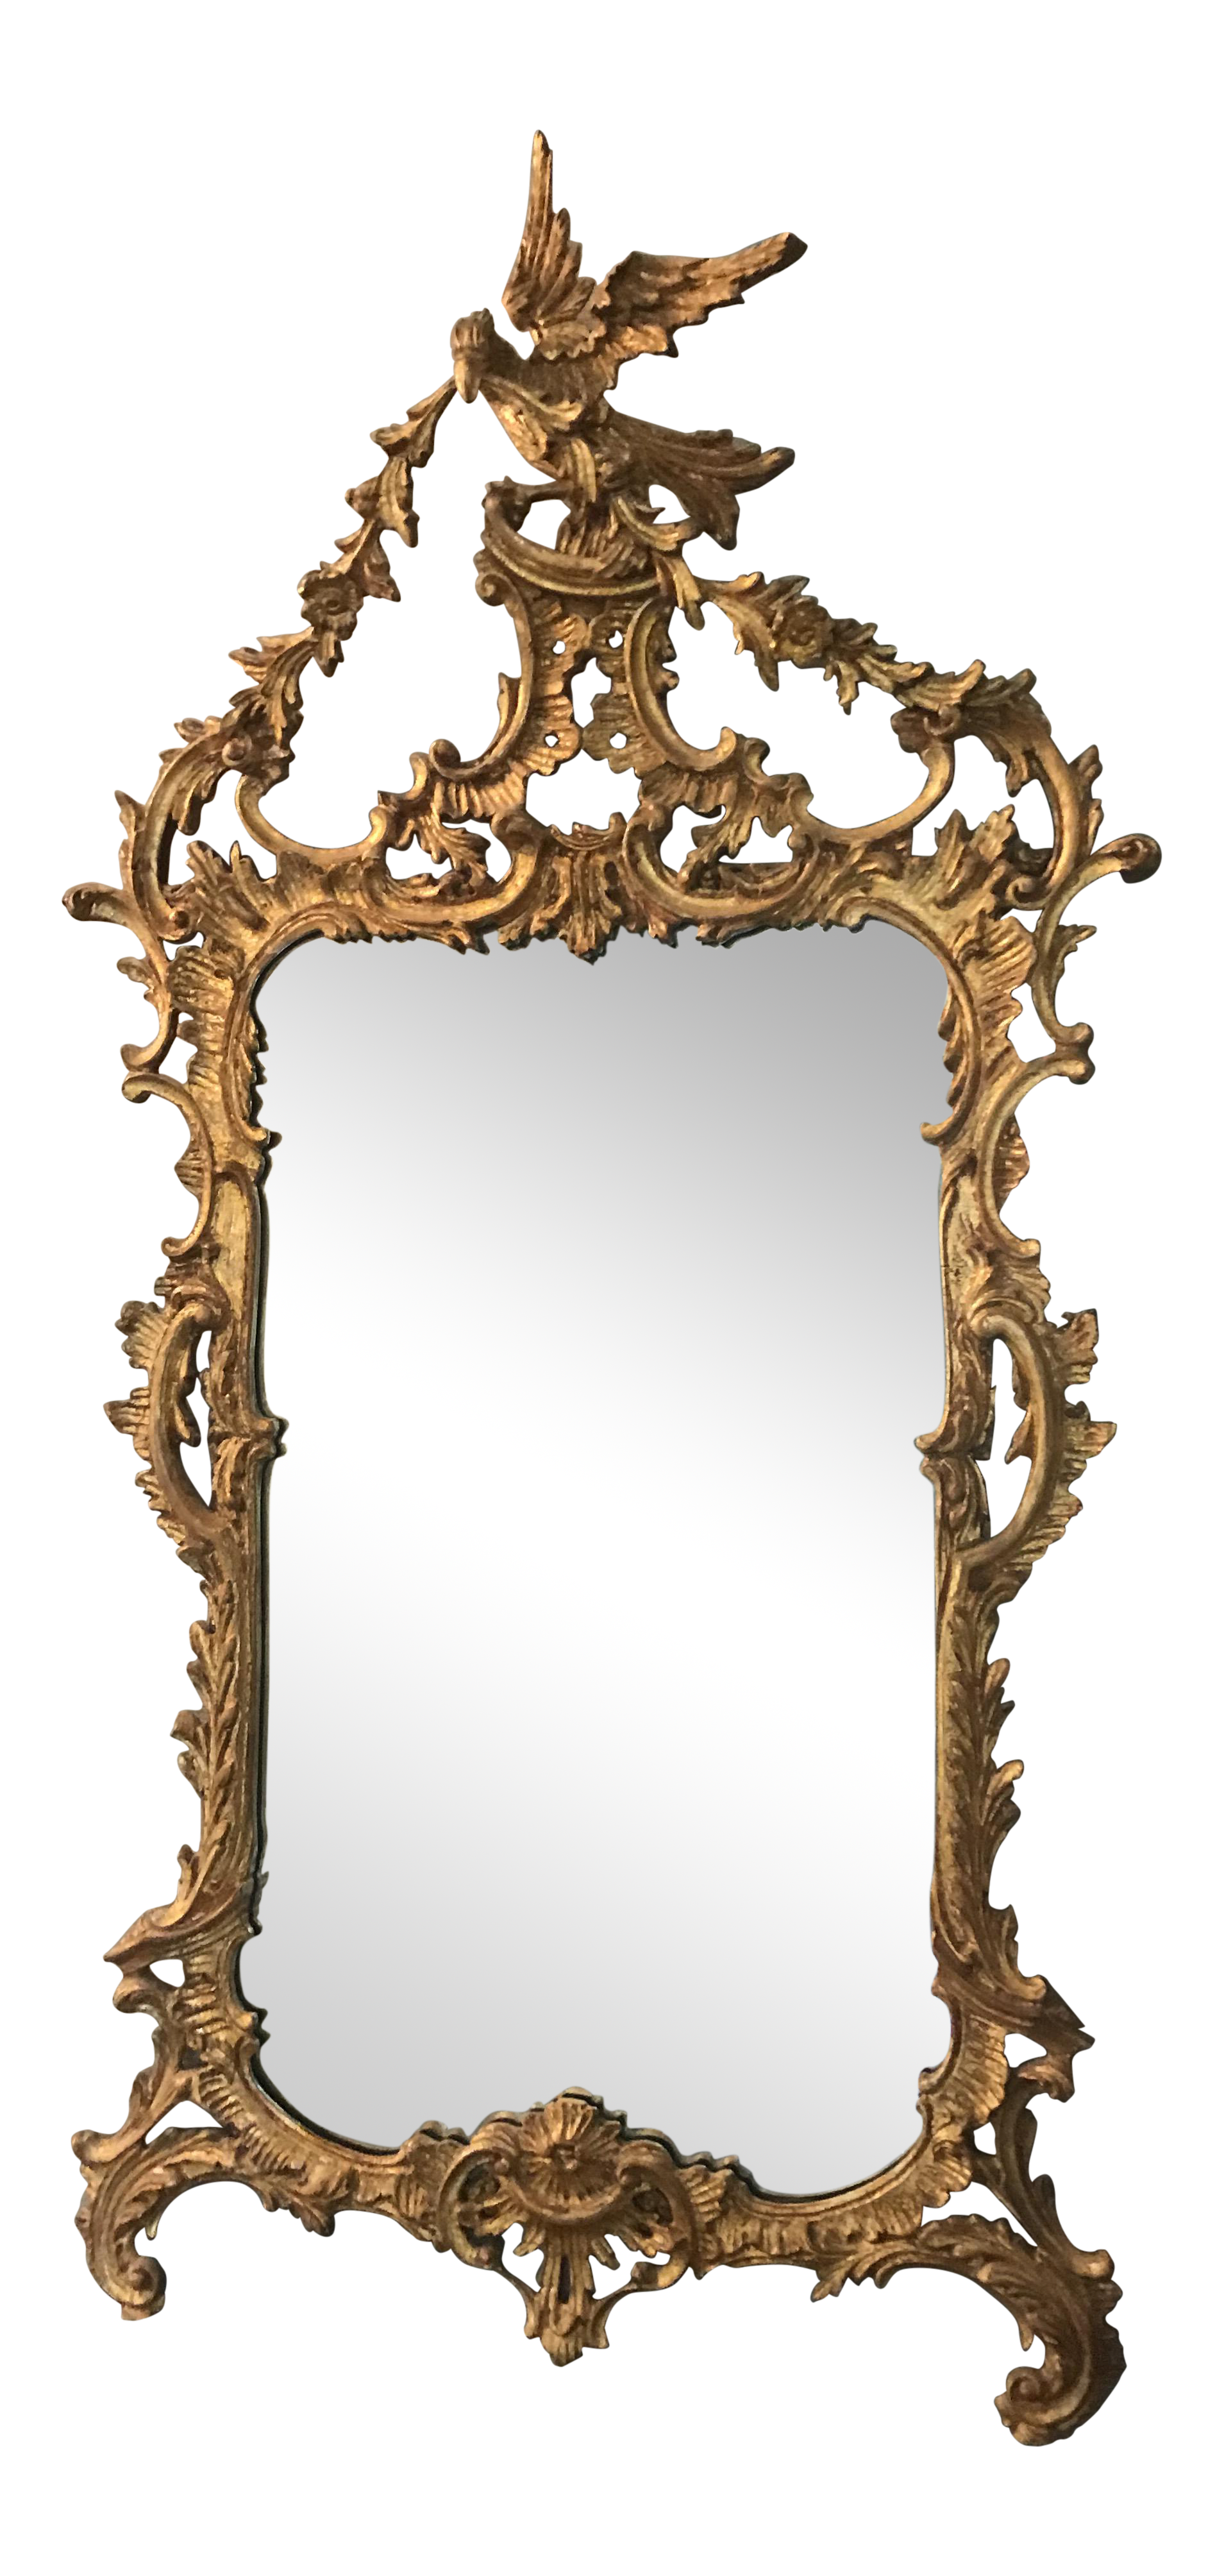 Reflection clipart big mirror, Reflection big mirror.